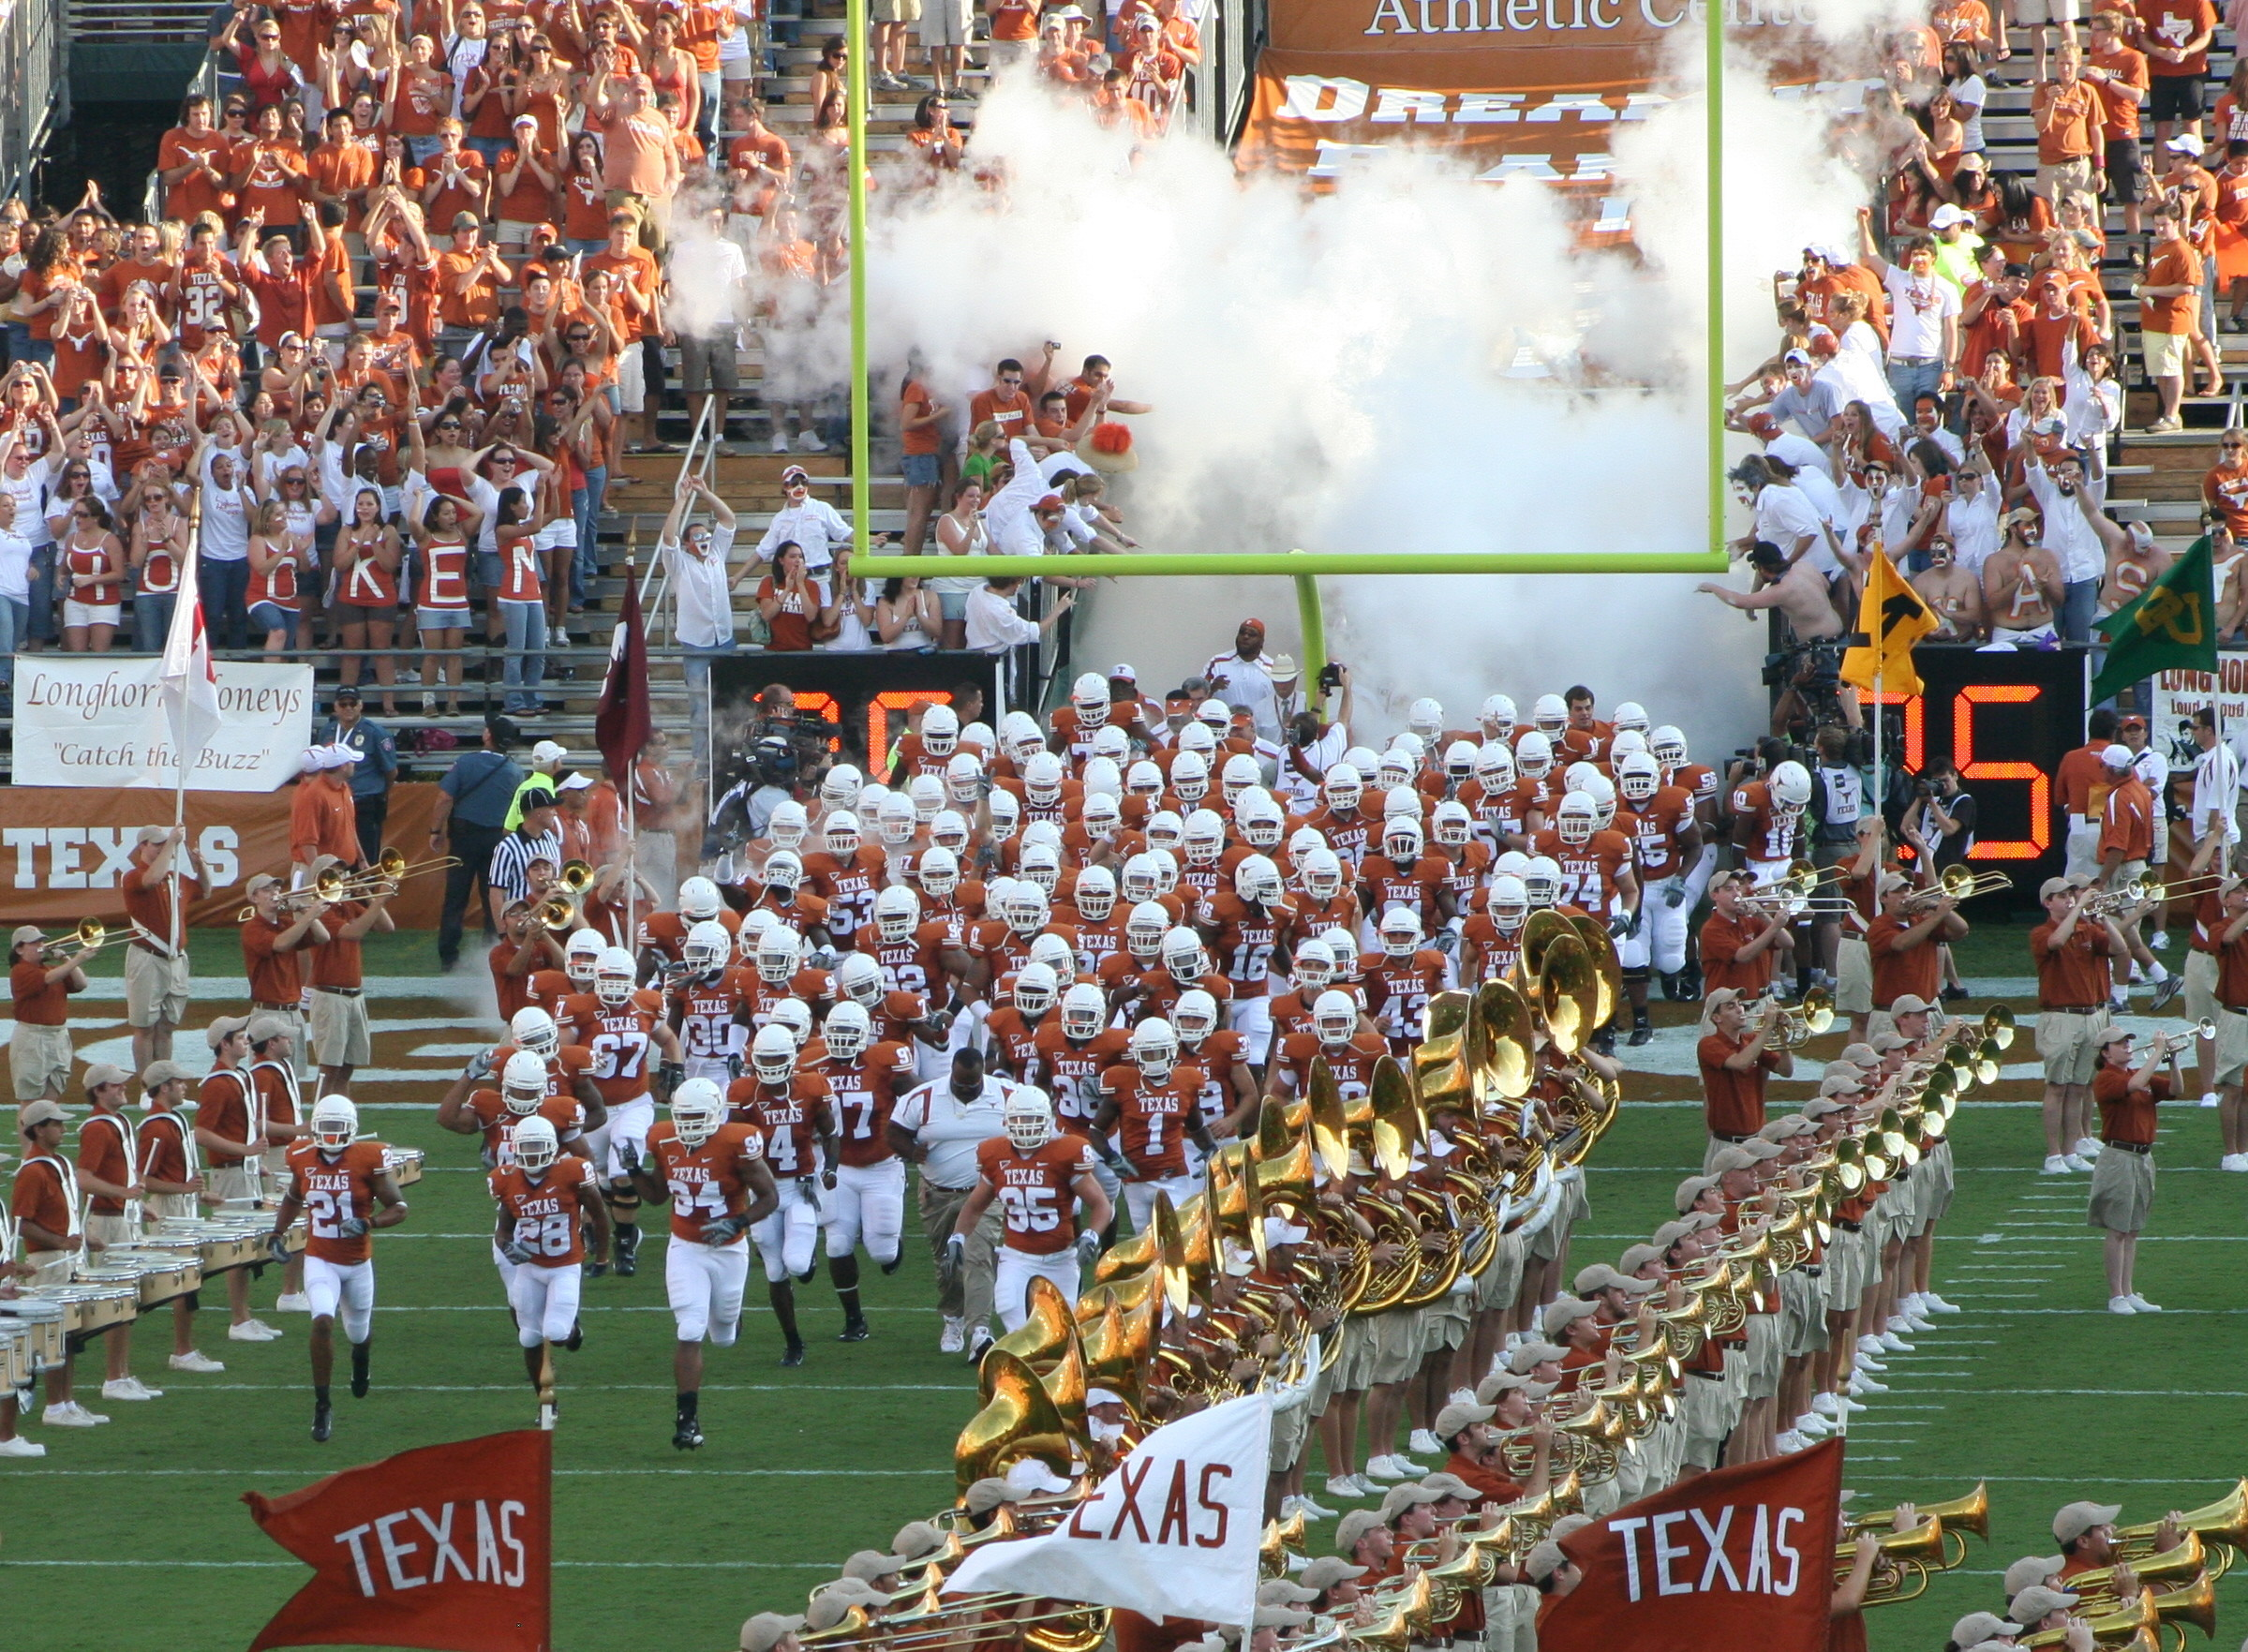 Texas Longhorns Football Team HD Wallpaper for your desktop background .